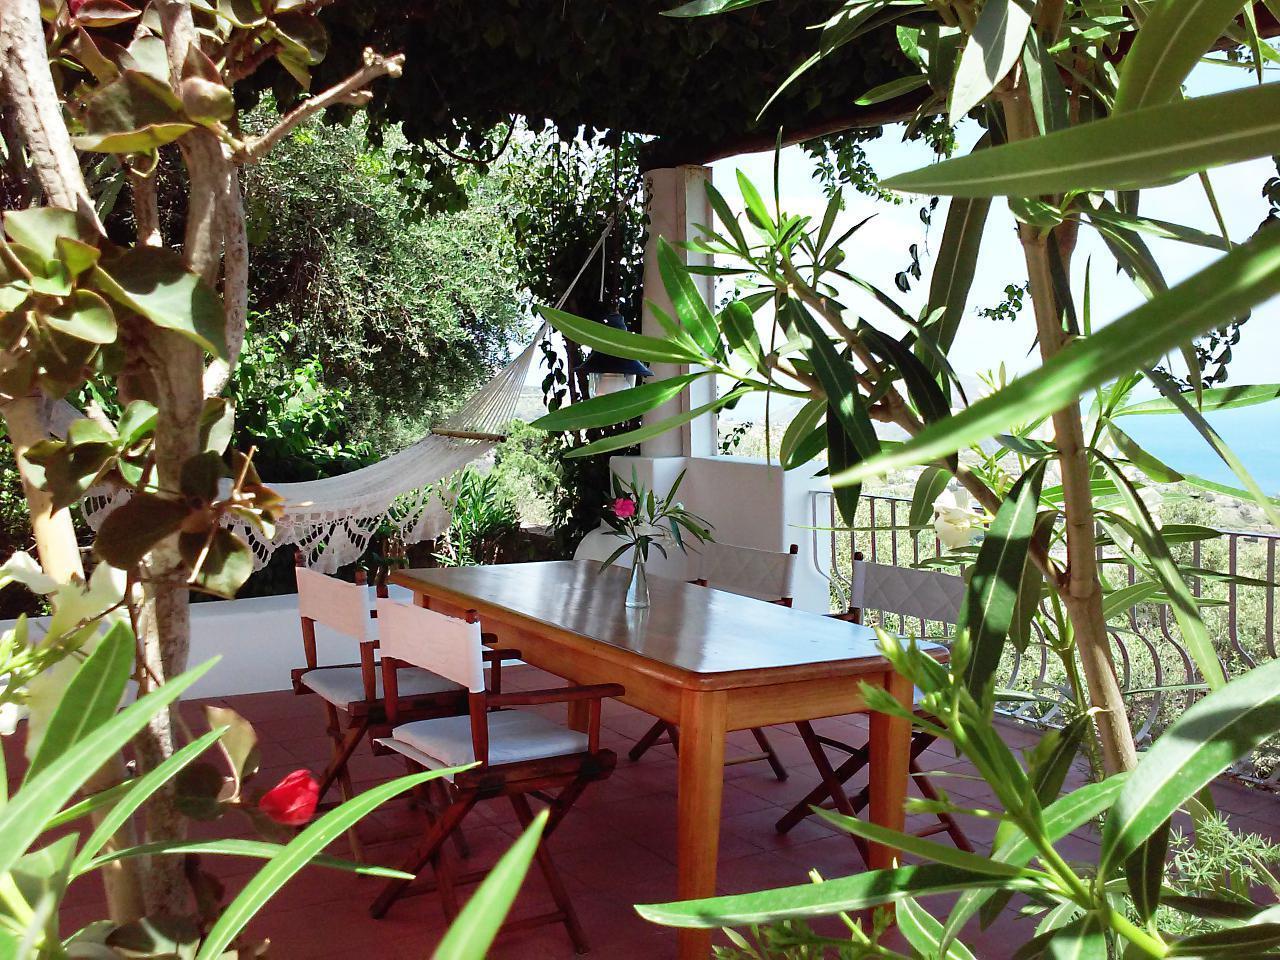 Maison de vacances Ferienhaushälfte Solandra auf sizilianischer Insel mit atemberaubenden Meeres-Rundblick (2038046), Lipari, Lipari, Sicile, Italie, image 6